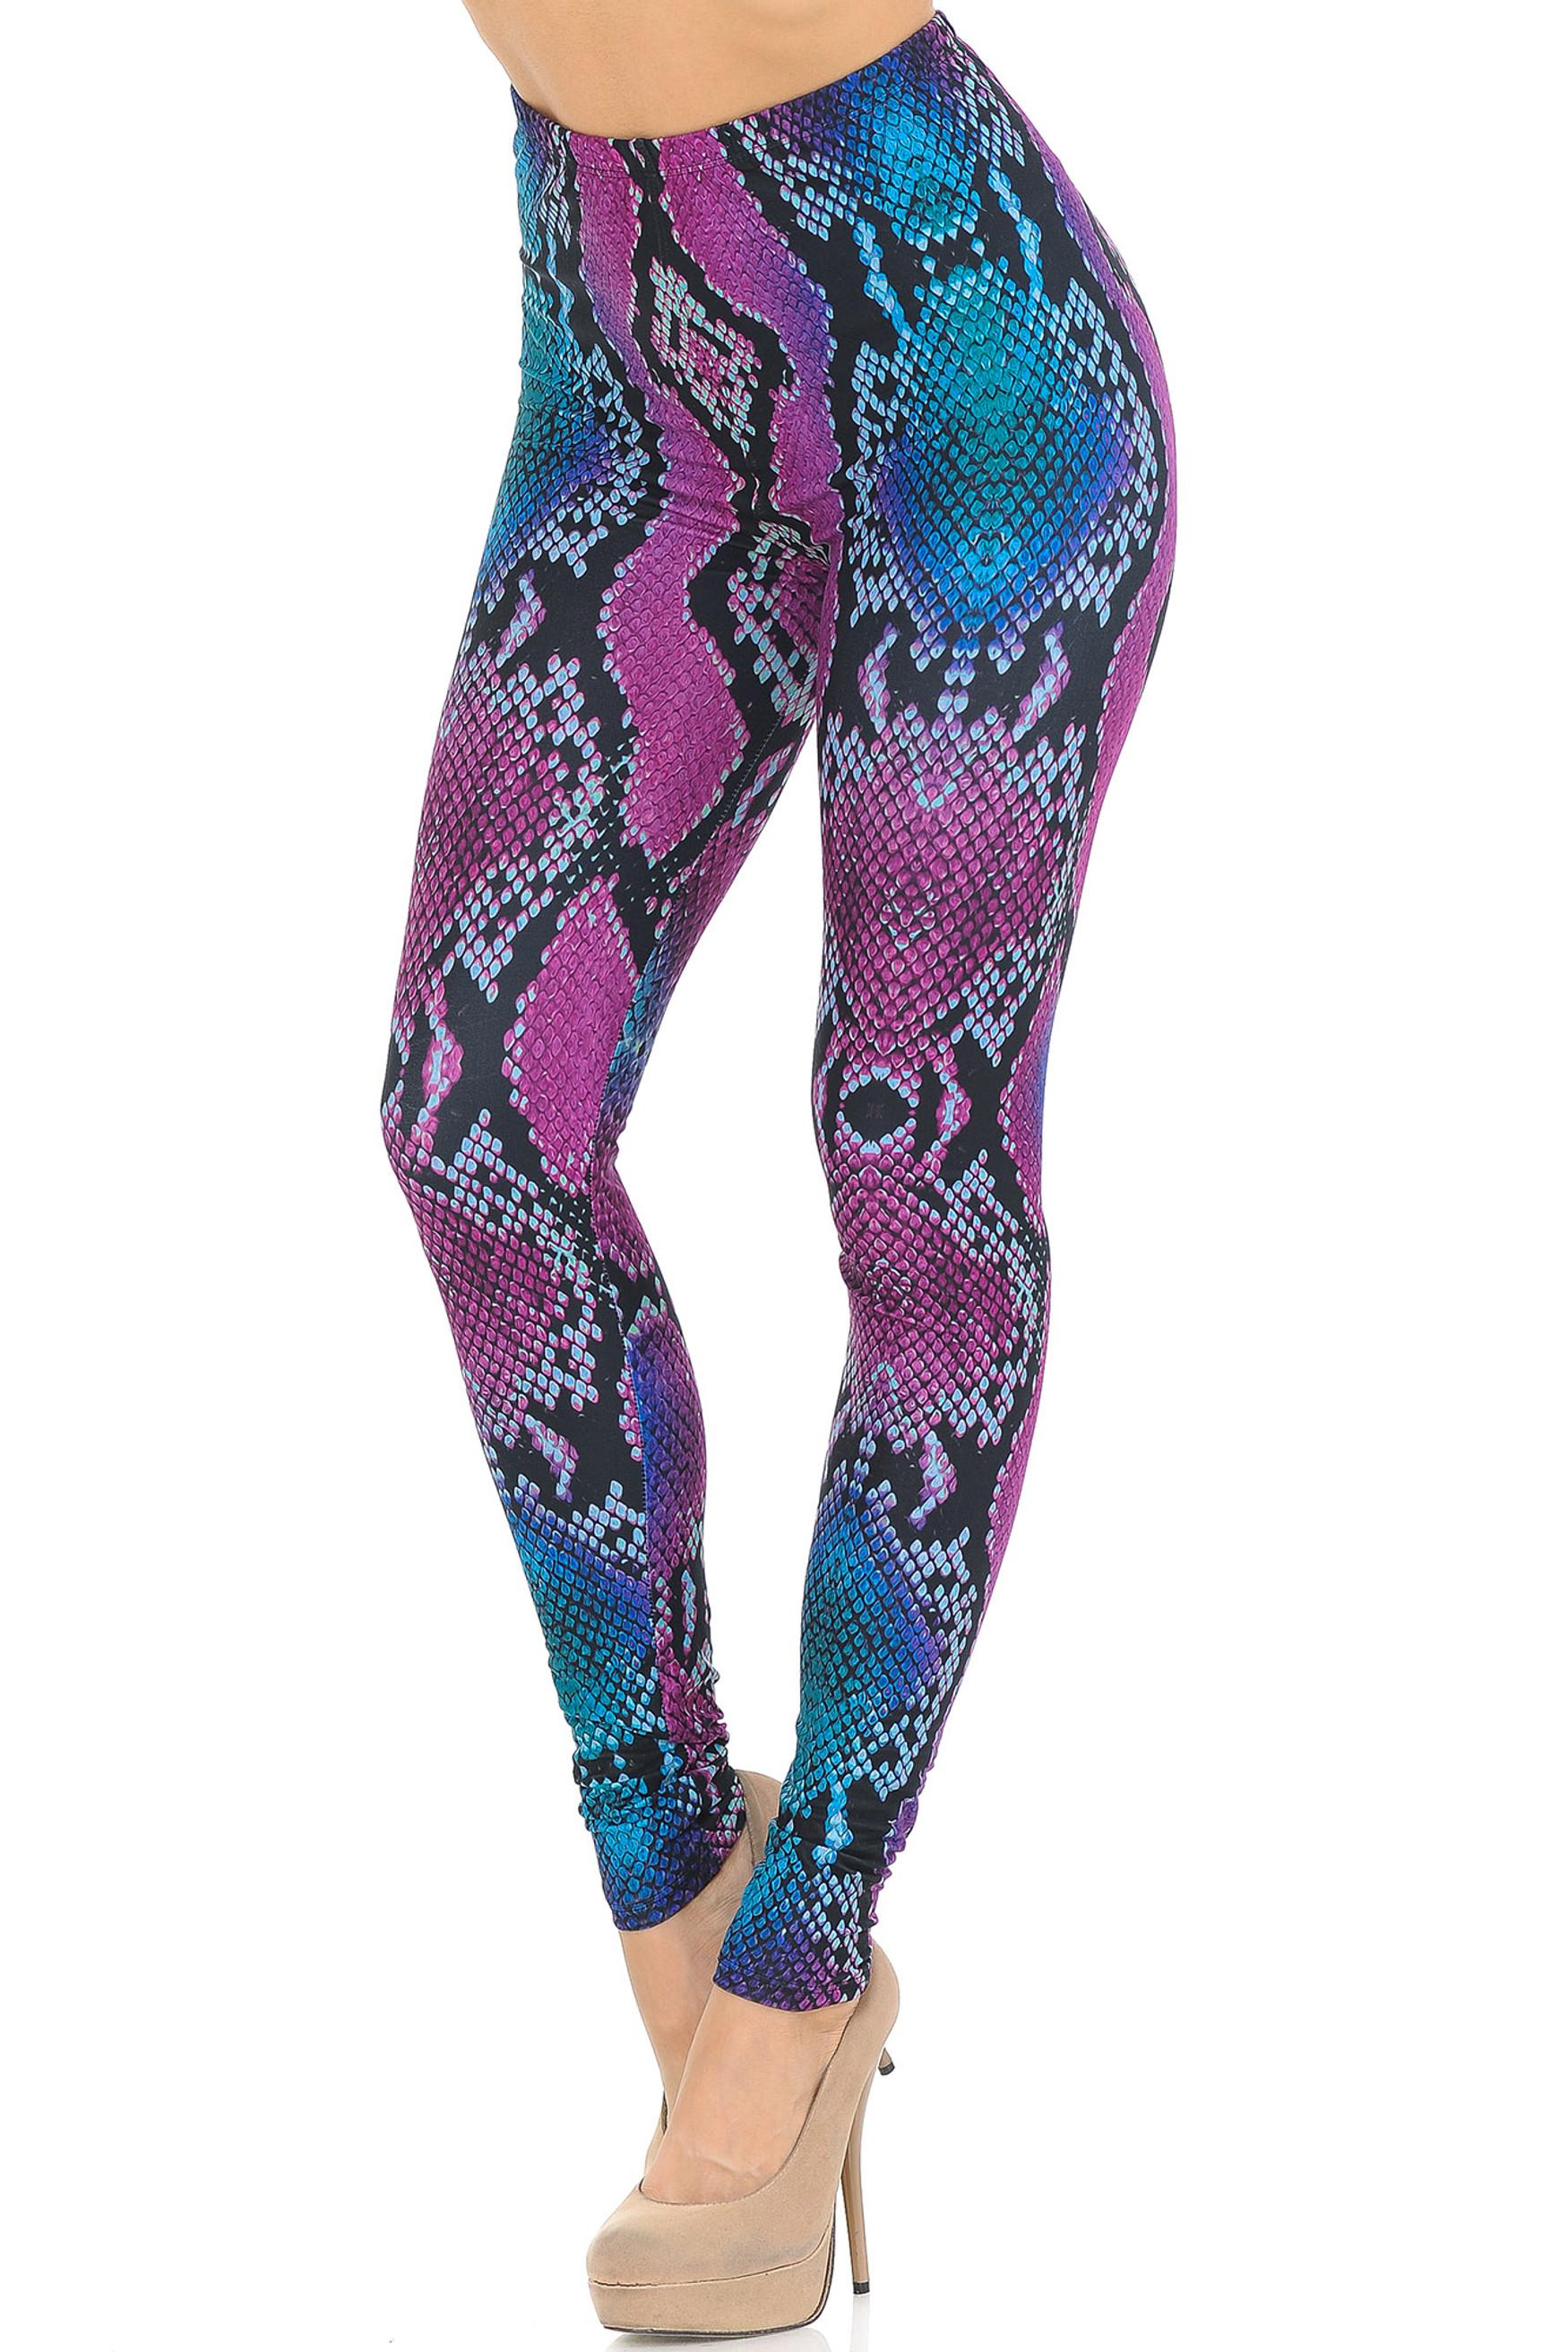 Creamy Soft Pink and Blue Snakeskin Leggings - USA Fashion™